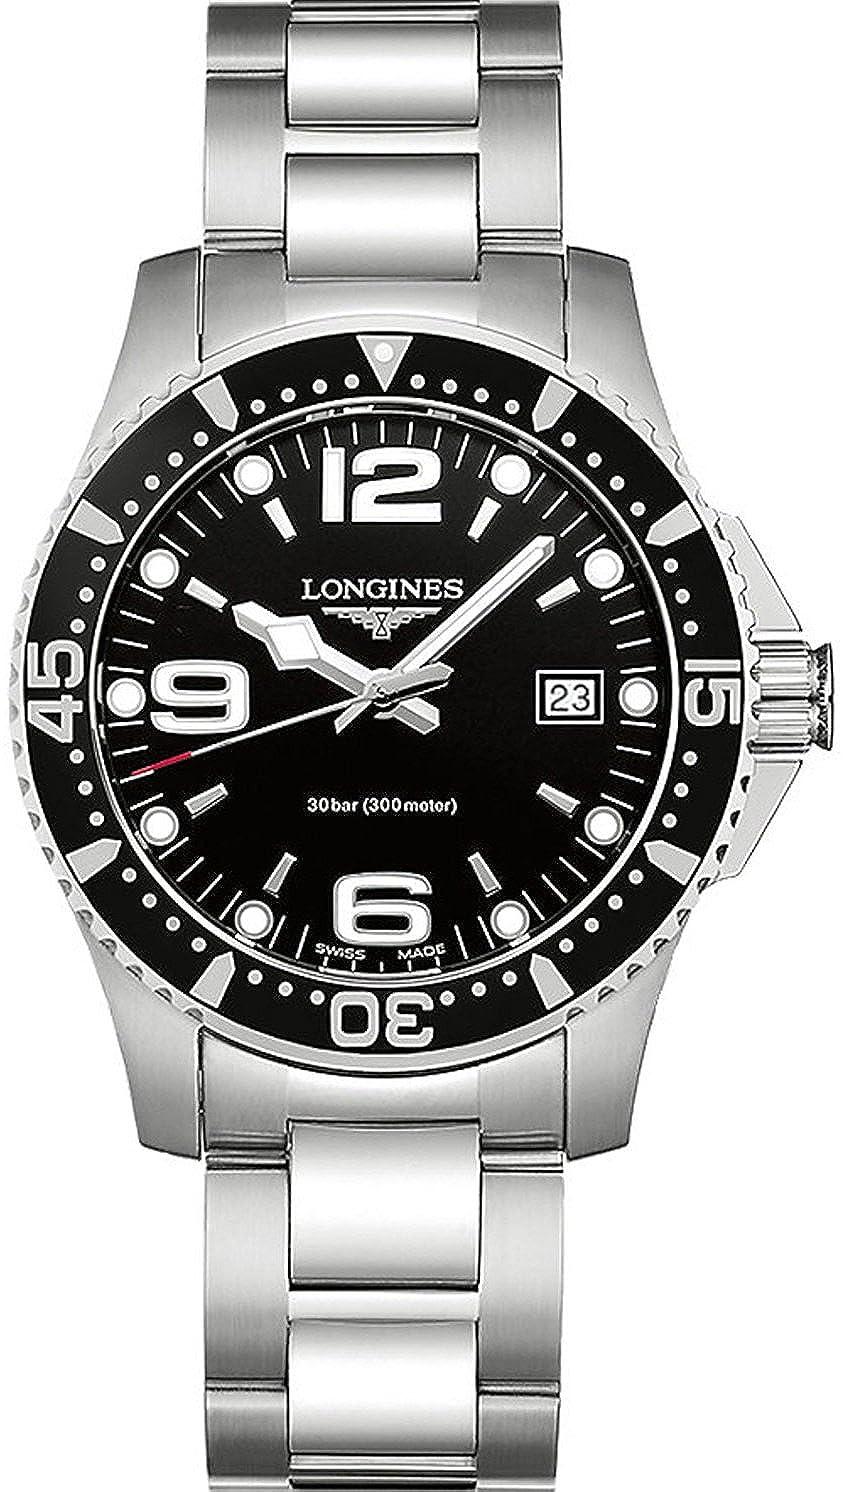 6fedc4201 Longines Hydroconquest Diving Men's Watch L37404566, 41 mm: Amazon.co.uk:  Watches